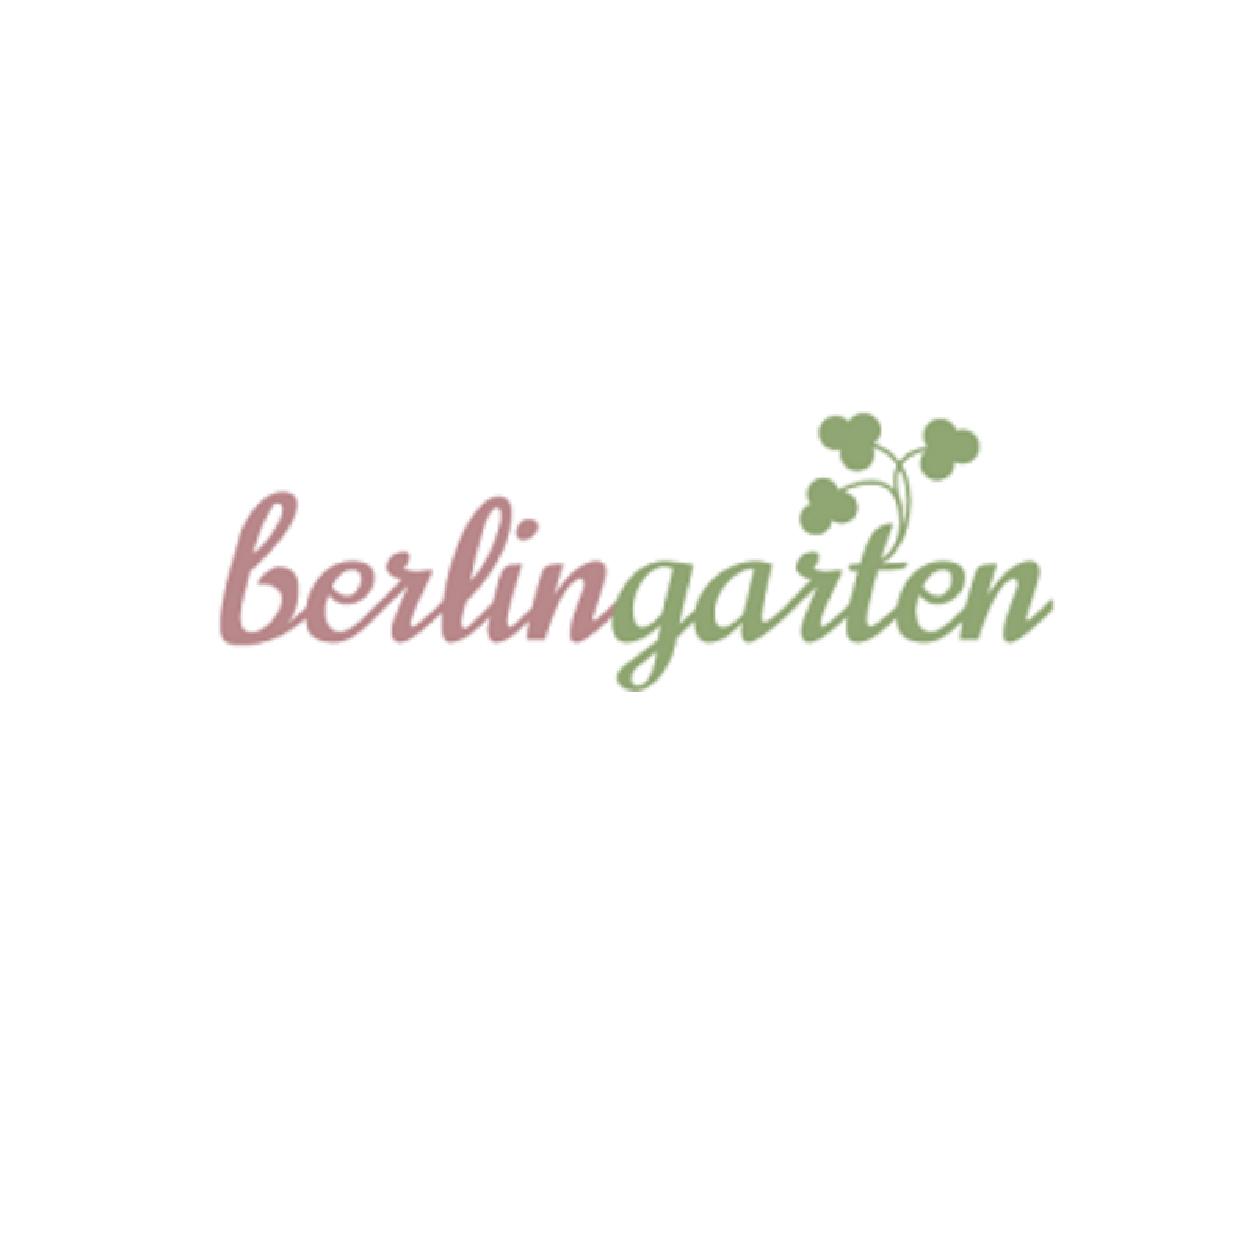 Logo_Berlingarten_Zeichenfläche 1.jpg